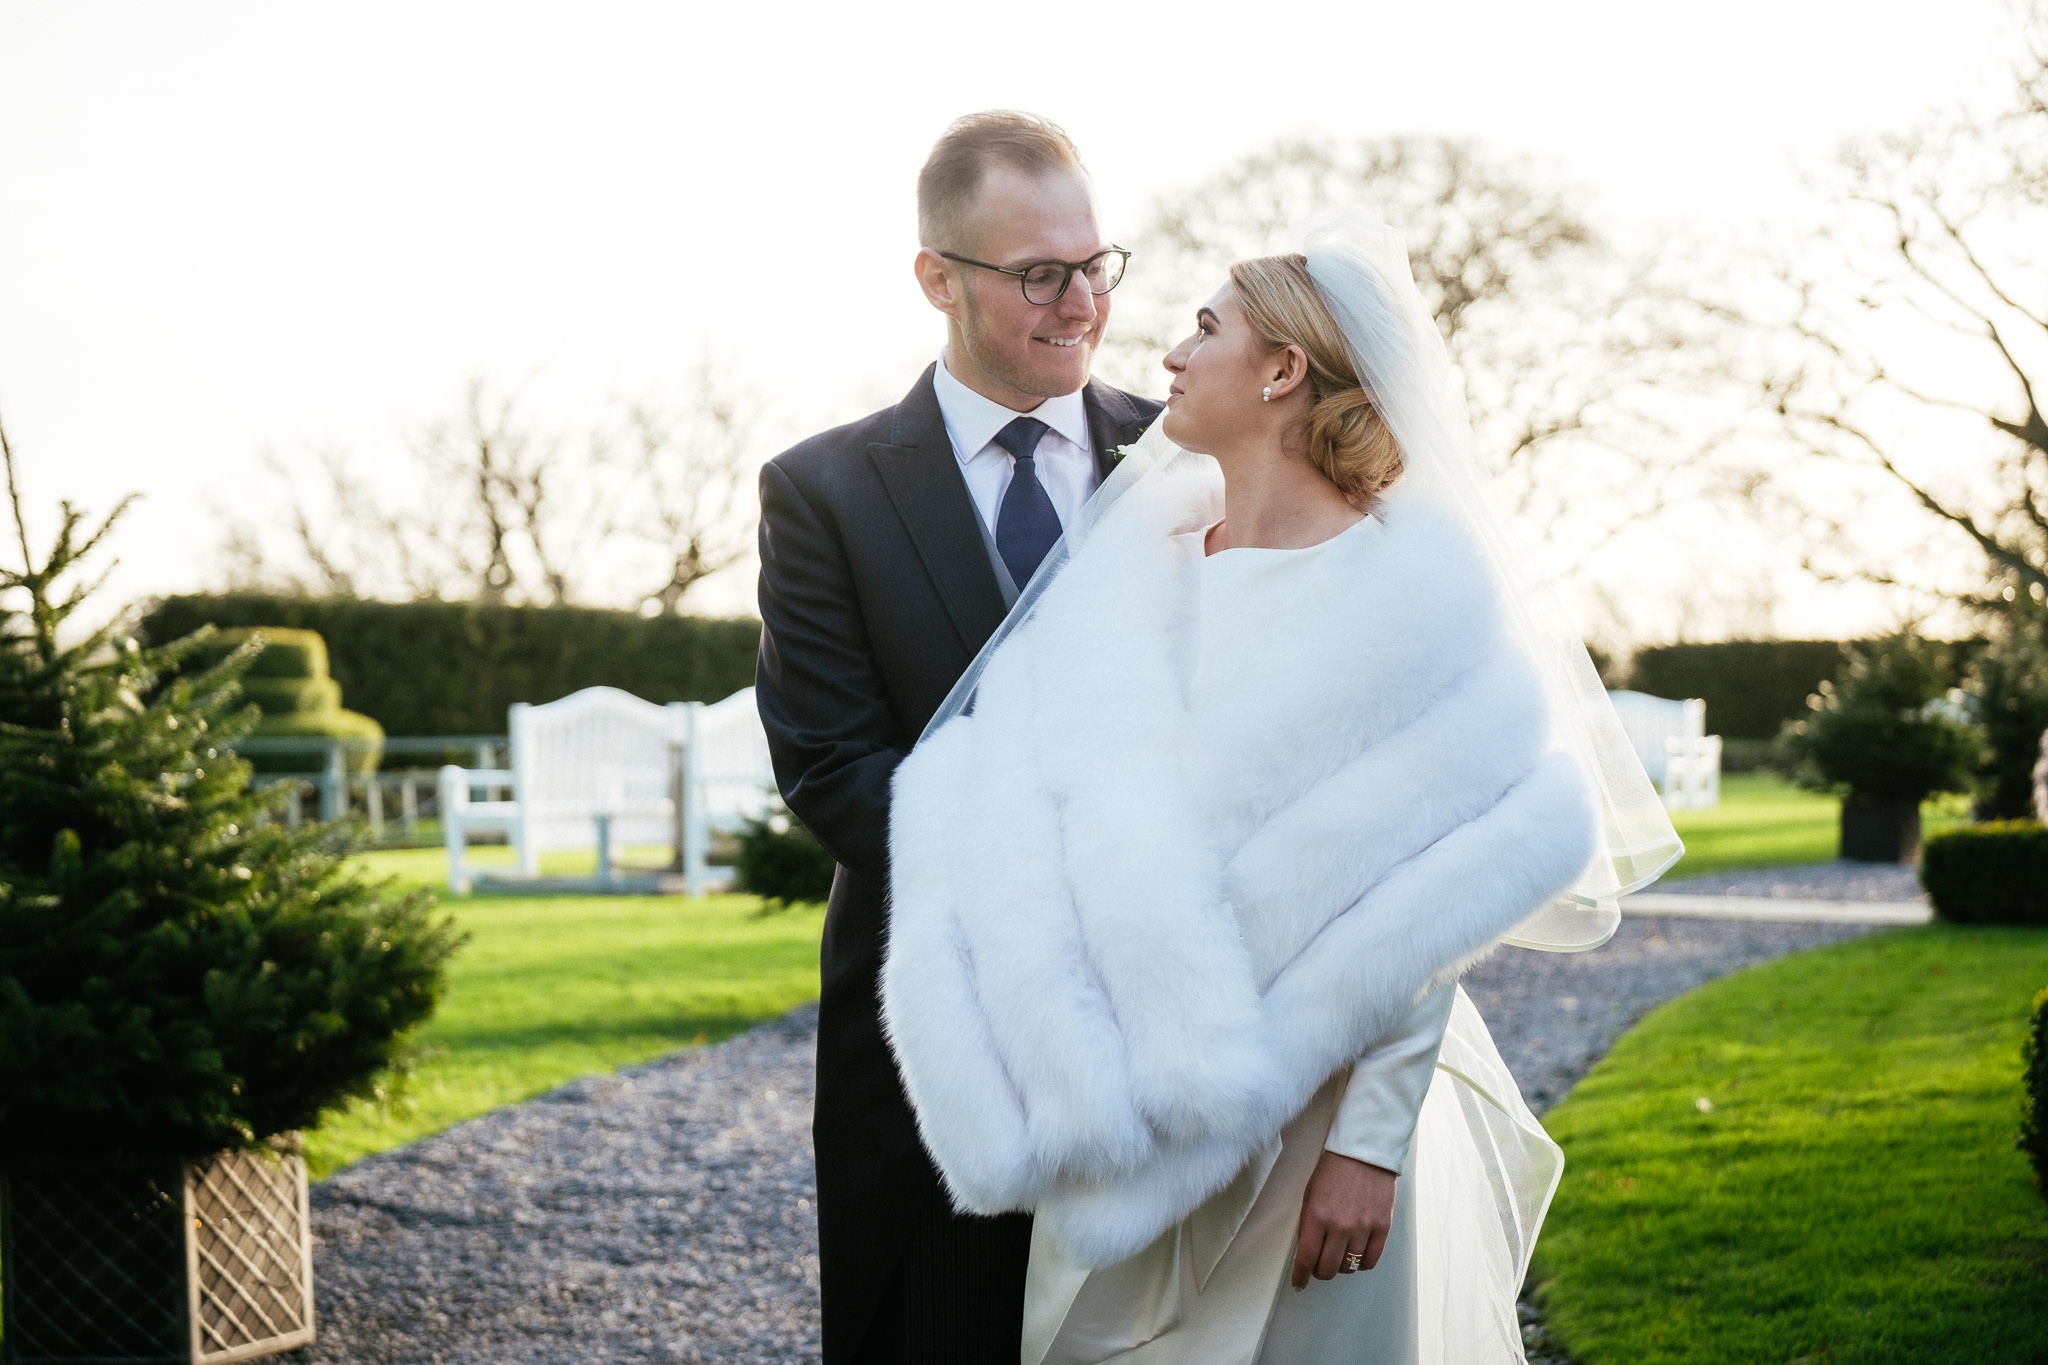 Virginia park lodge Wedding Photographer 102